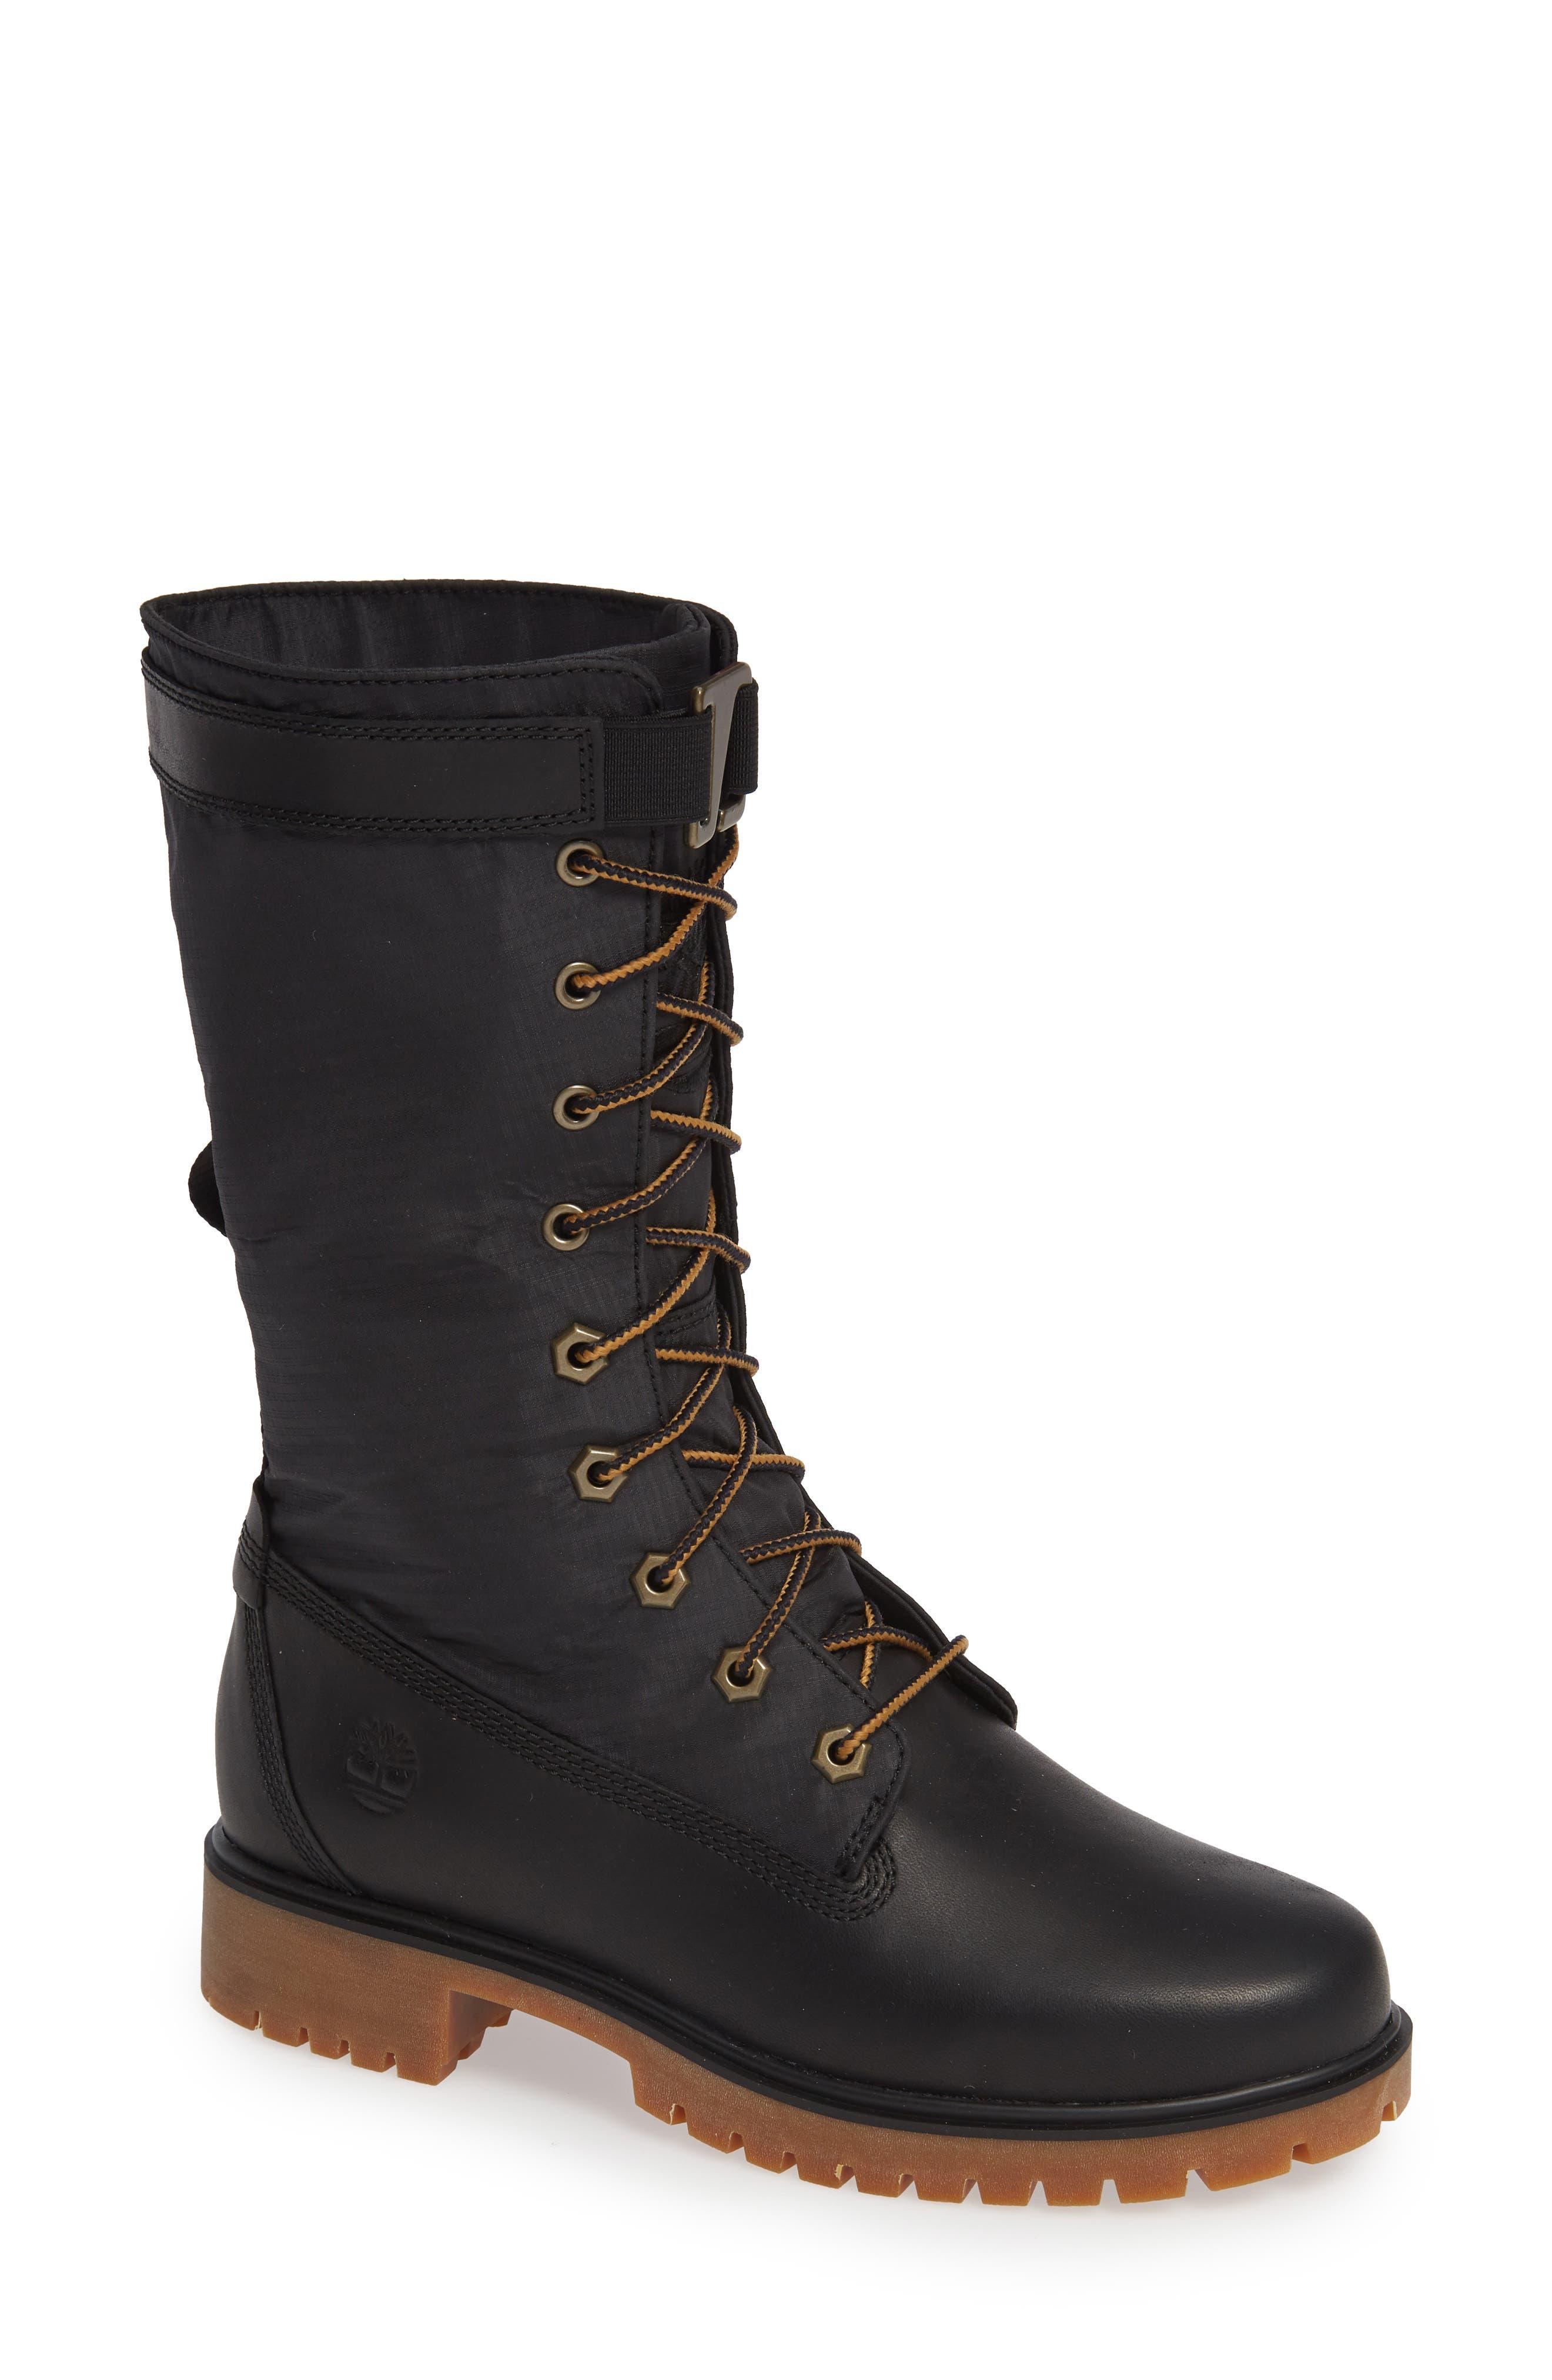 TIMBERLAND Jayne Waterproof Boot, Main, color, JET BLACK LEATHER